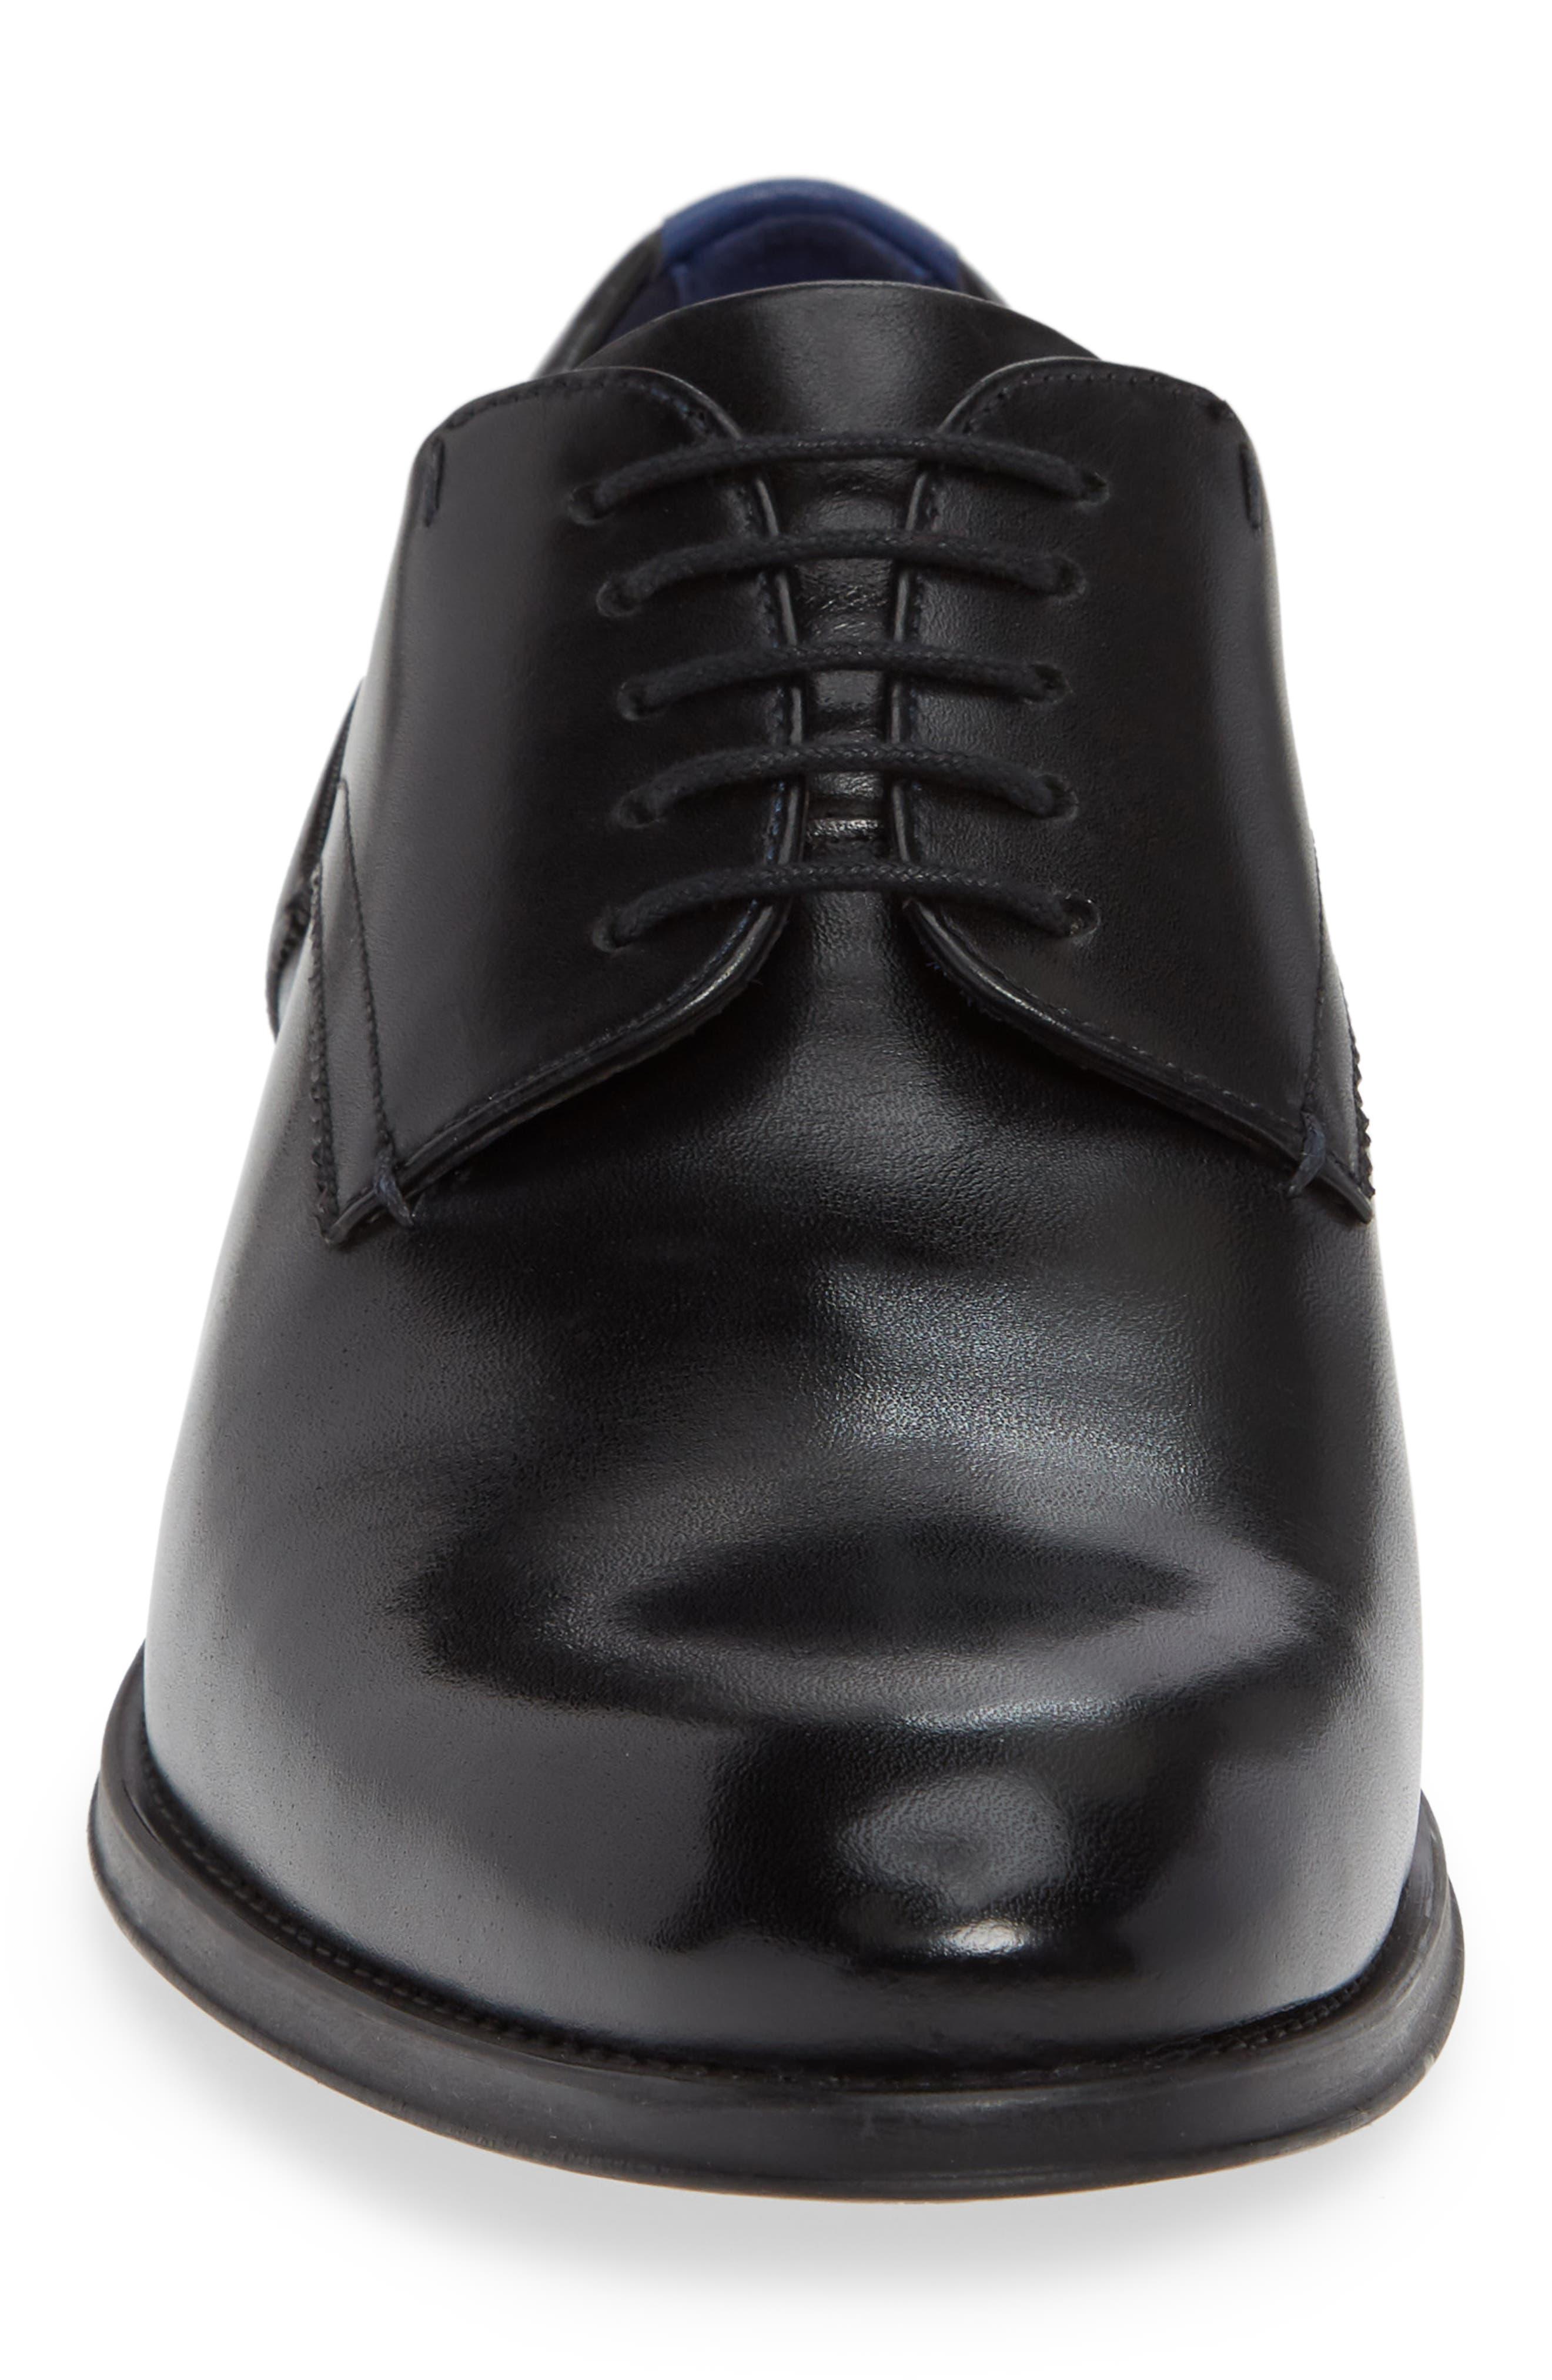 Jusdim Plain Toe Derby,                             Alternate thumbnail 4, color,                             BLACK